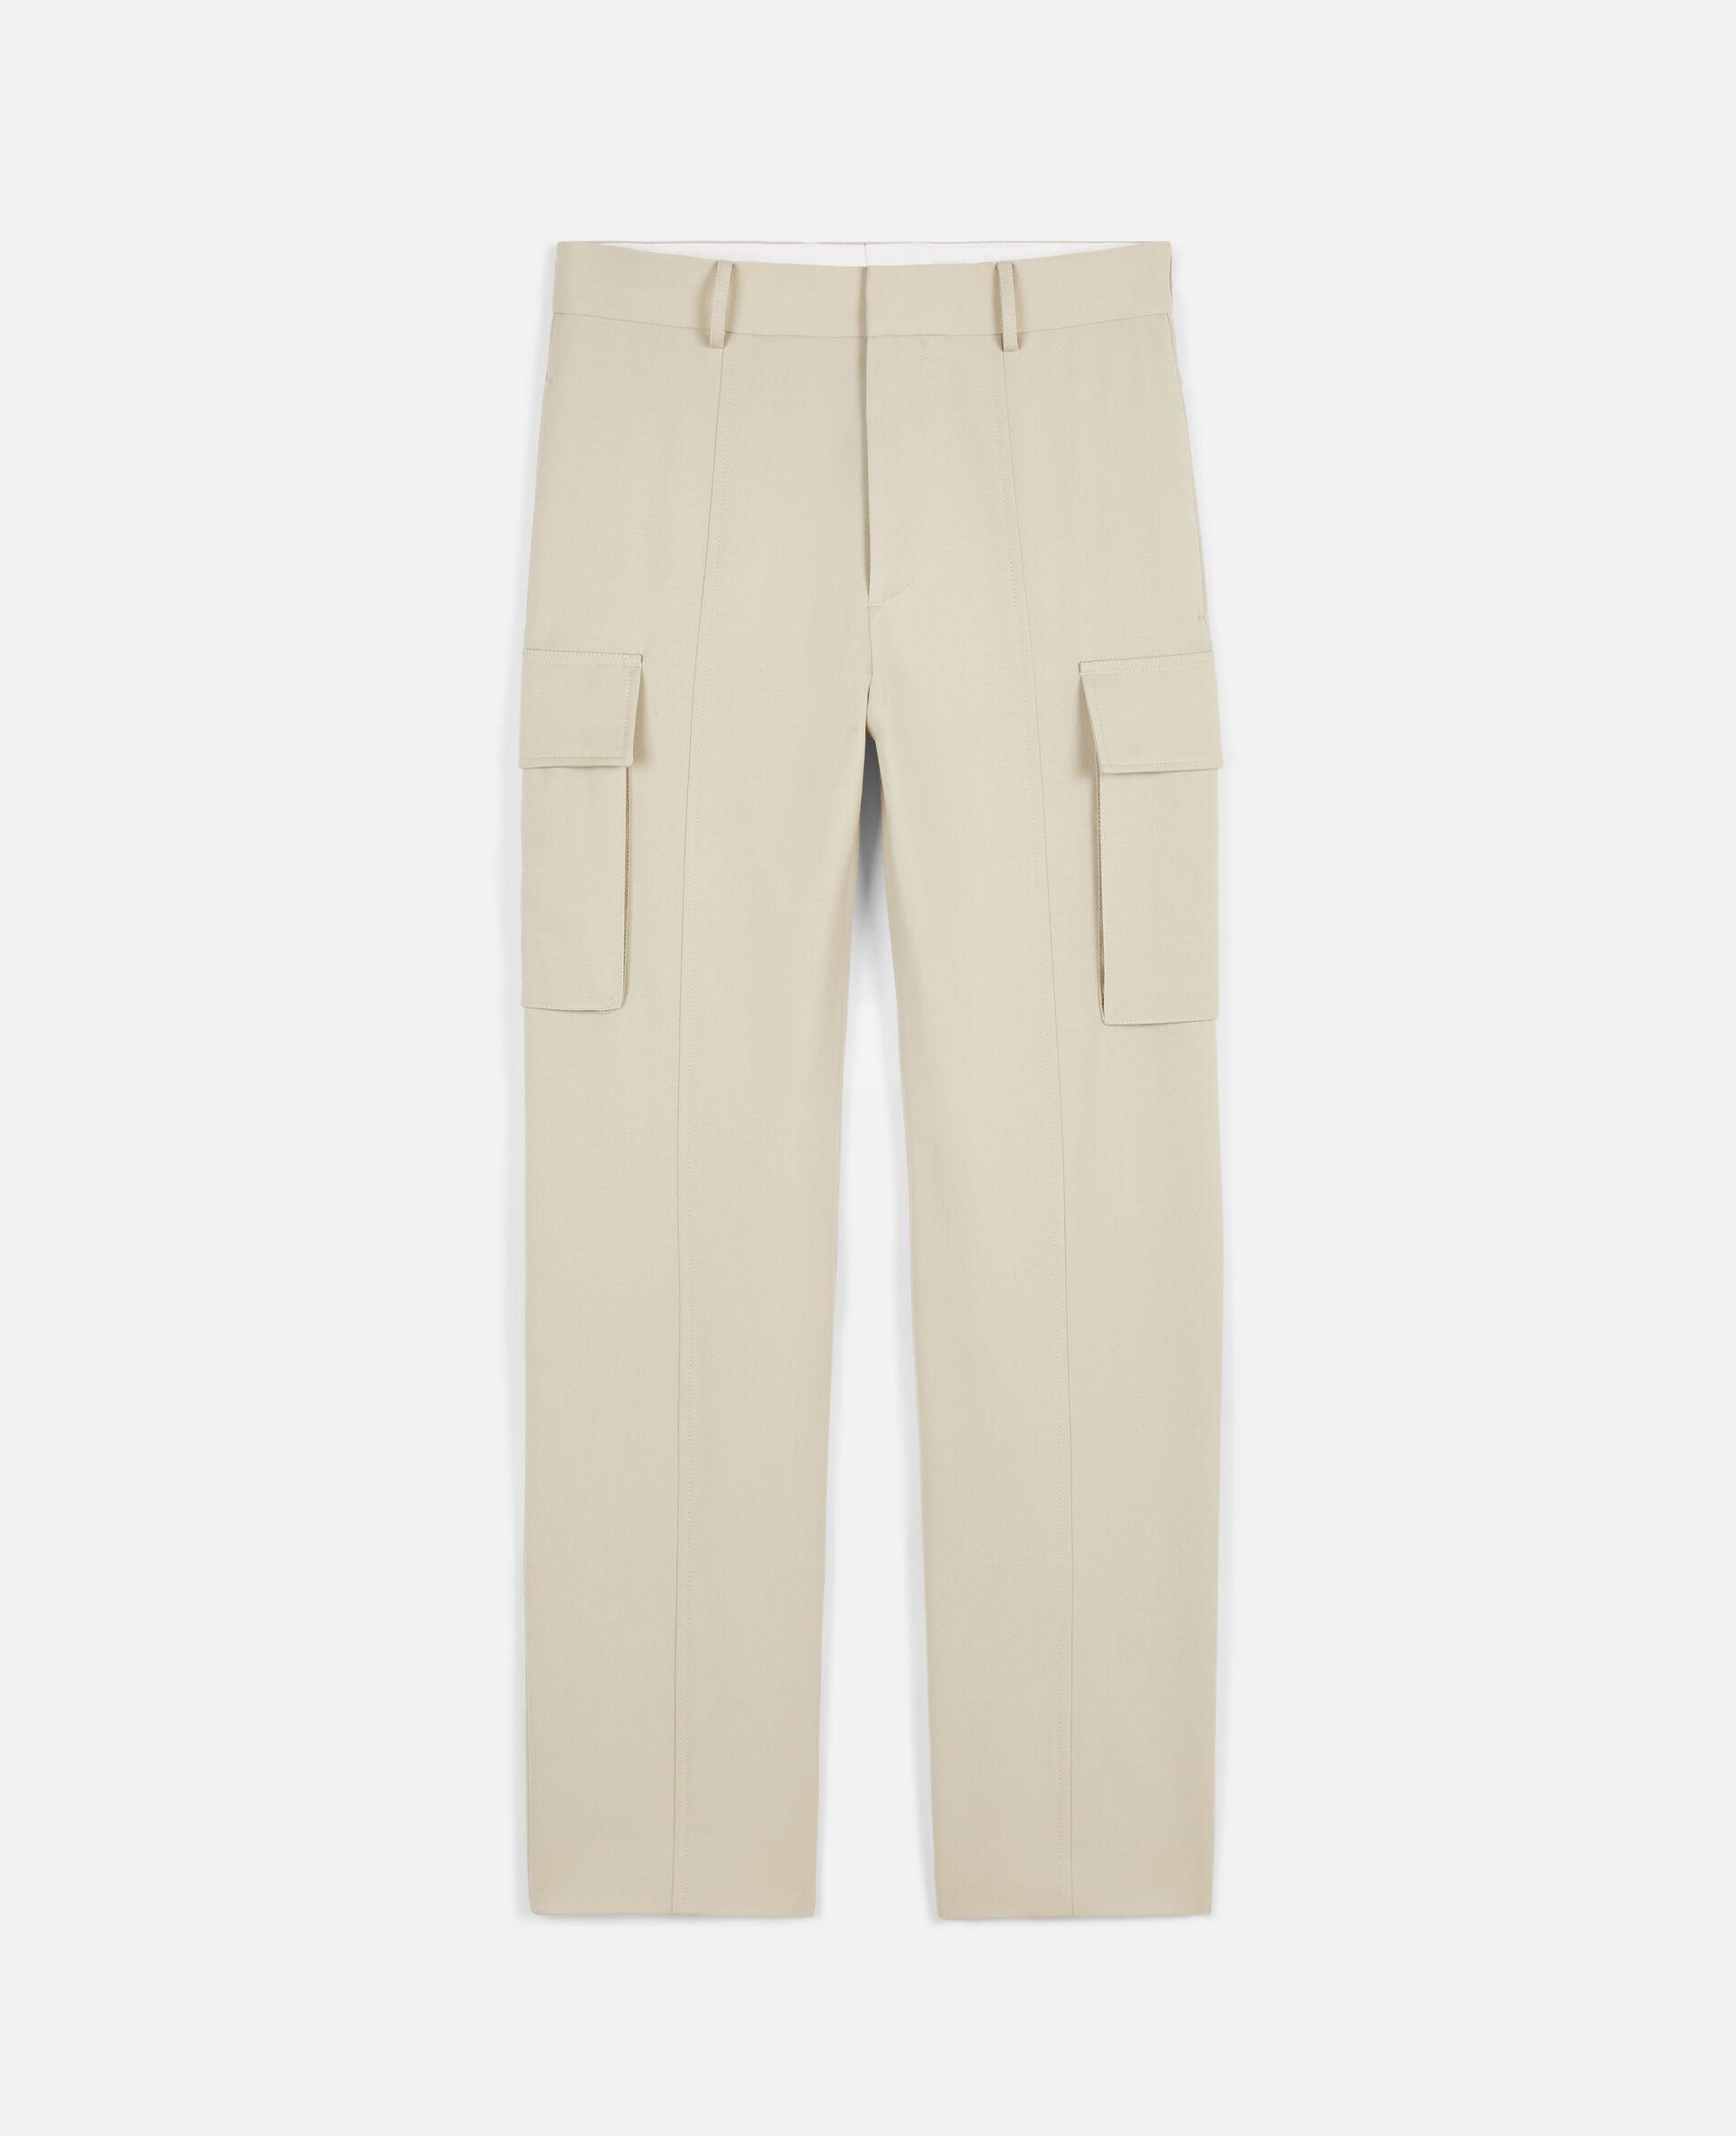 Pantaloni Sabbia Chiaro-Beige-large image number 0